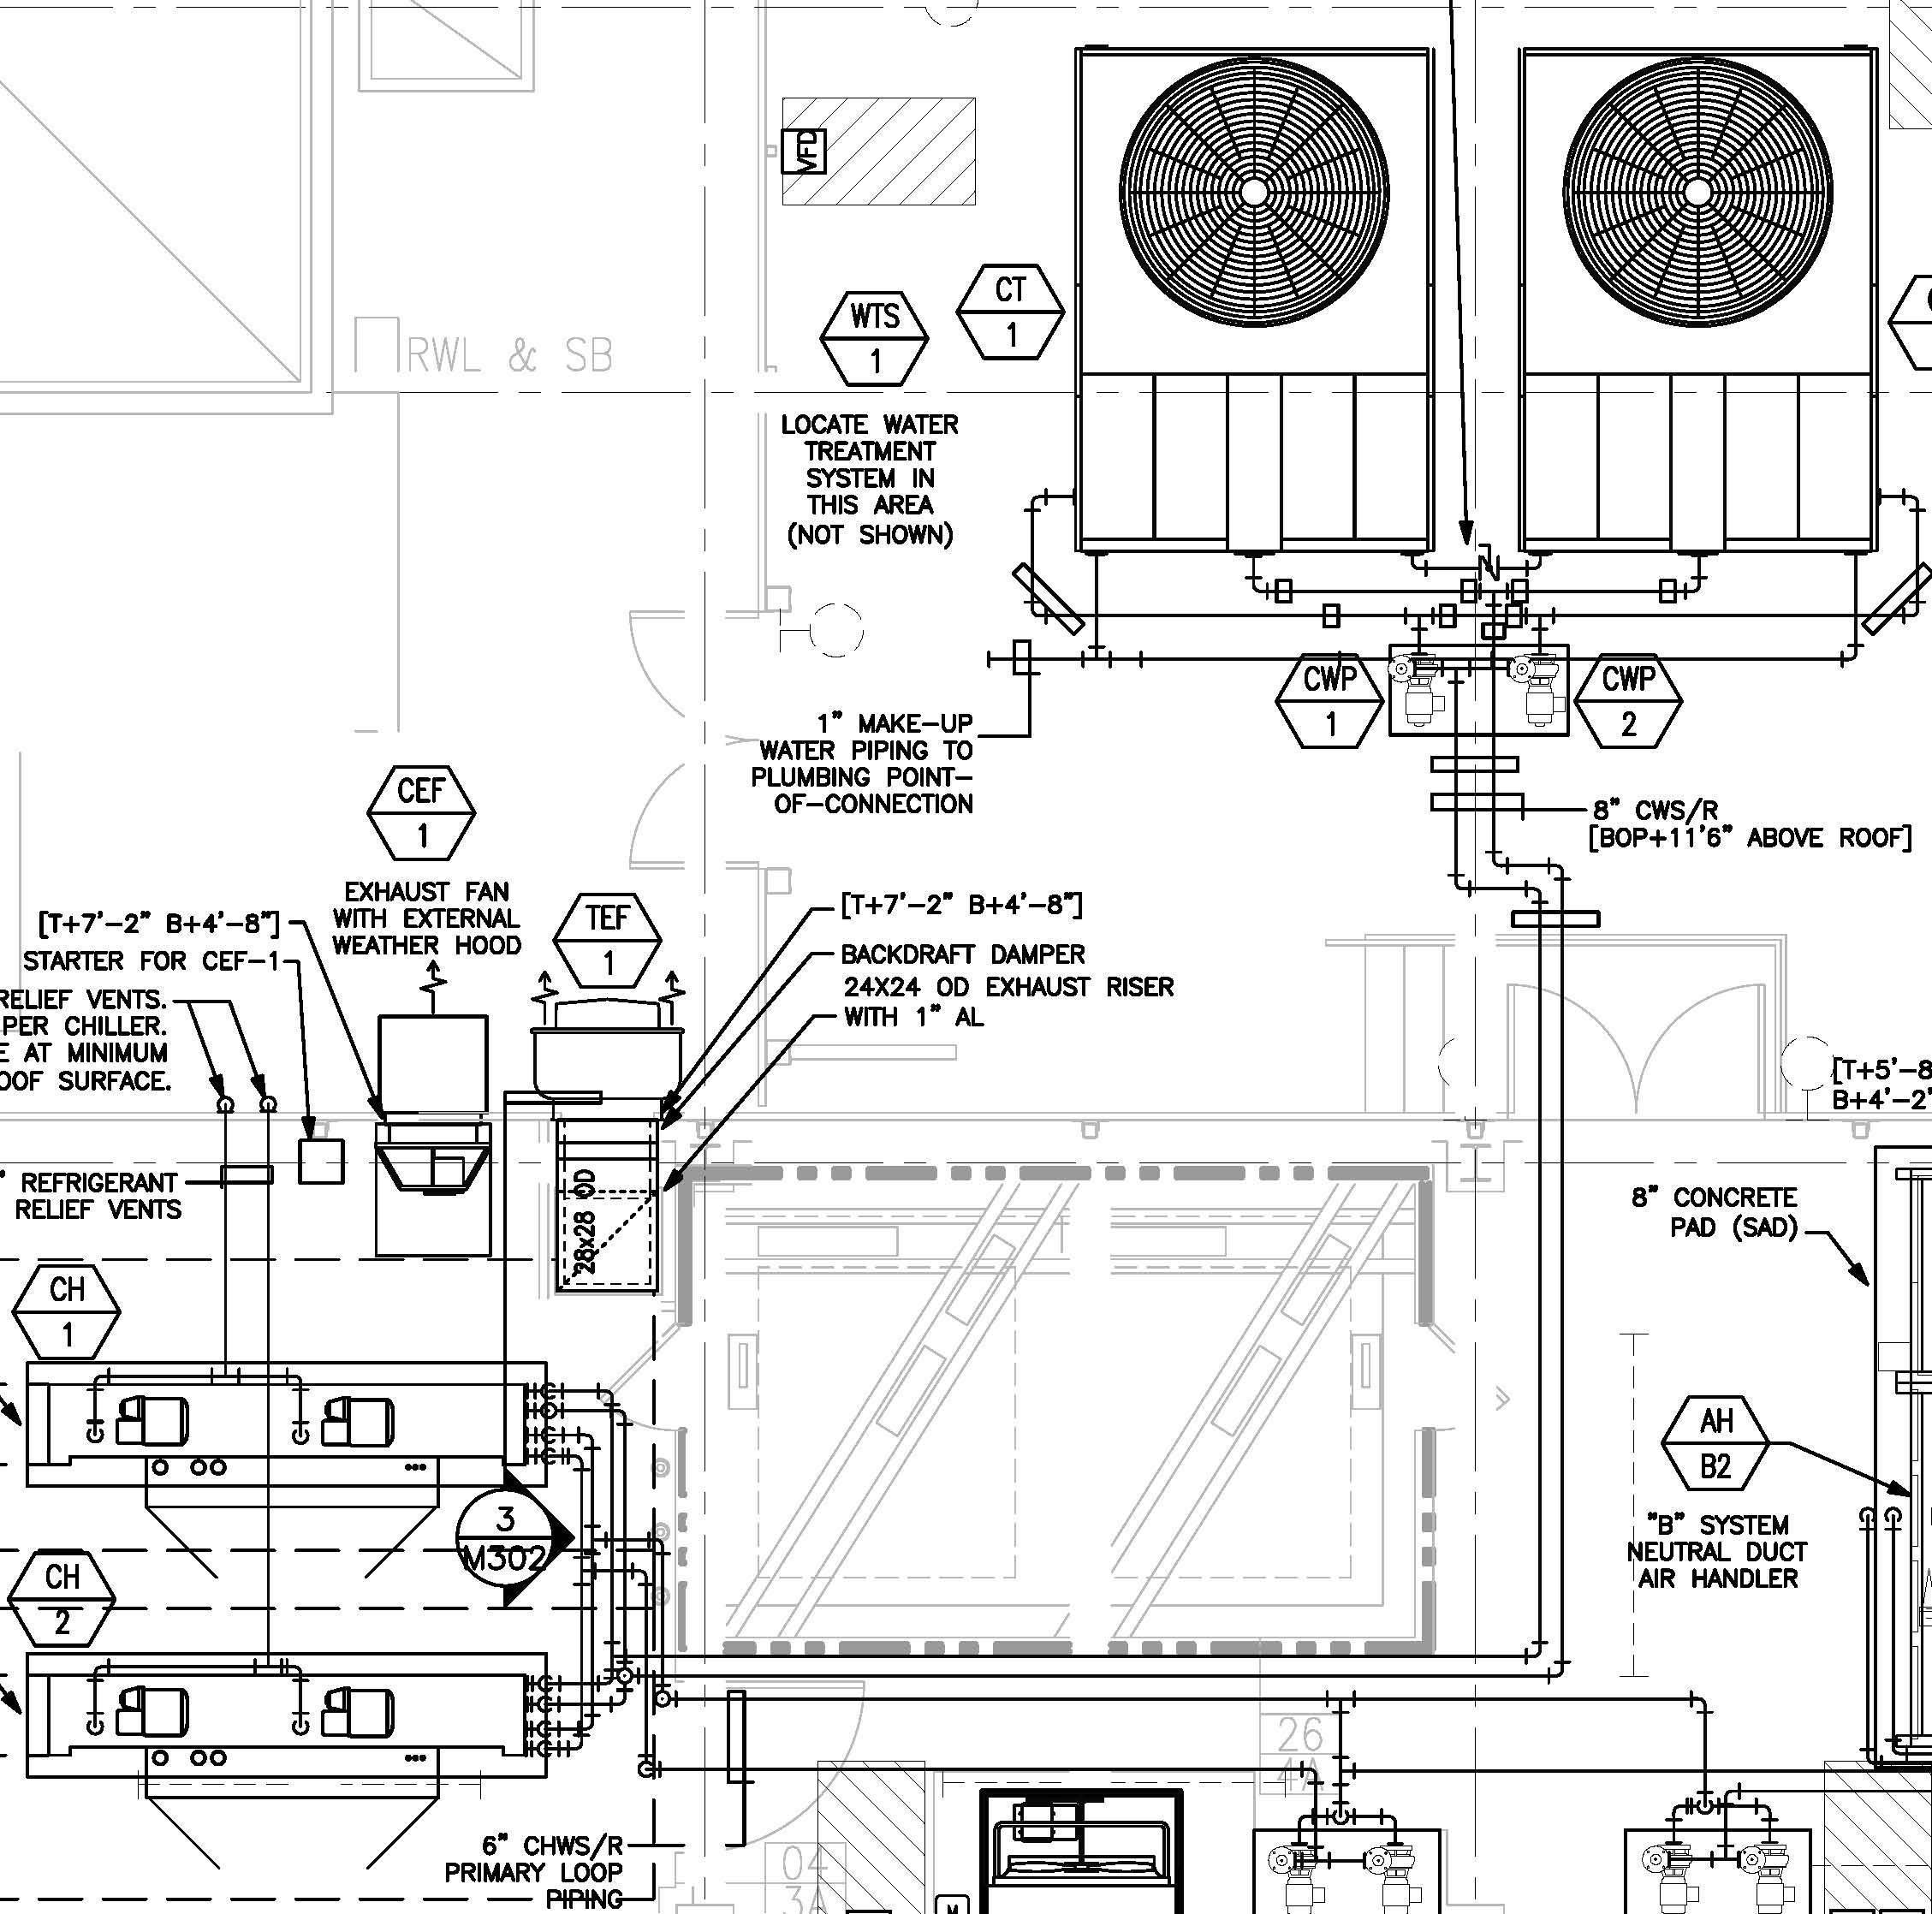 Kohler Generator Wiring Diagram Average Gpa Generator Archives Feefee Save Typical Generator